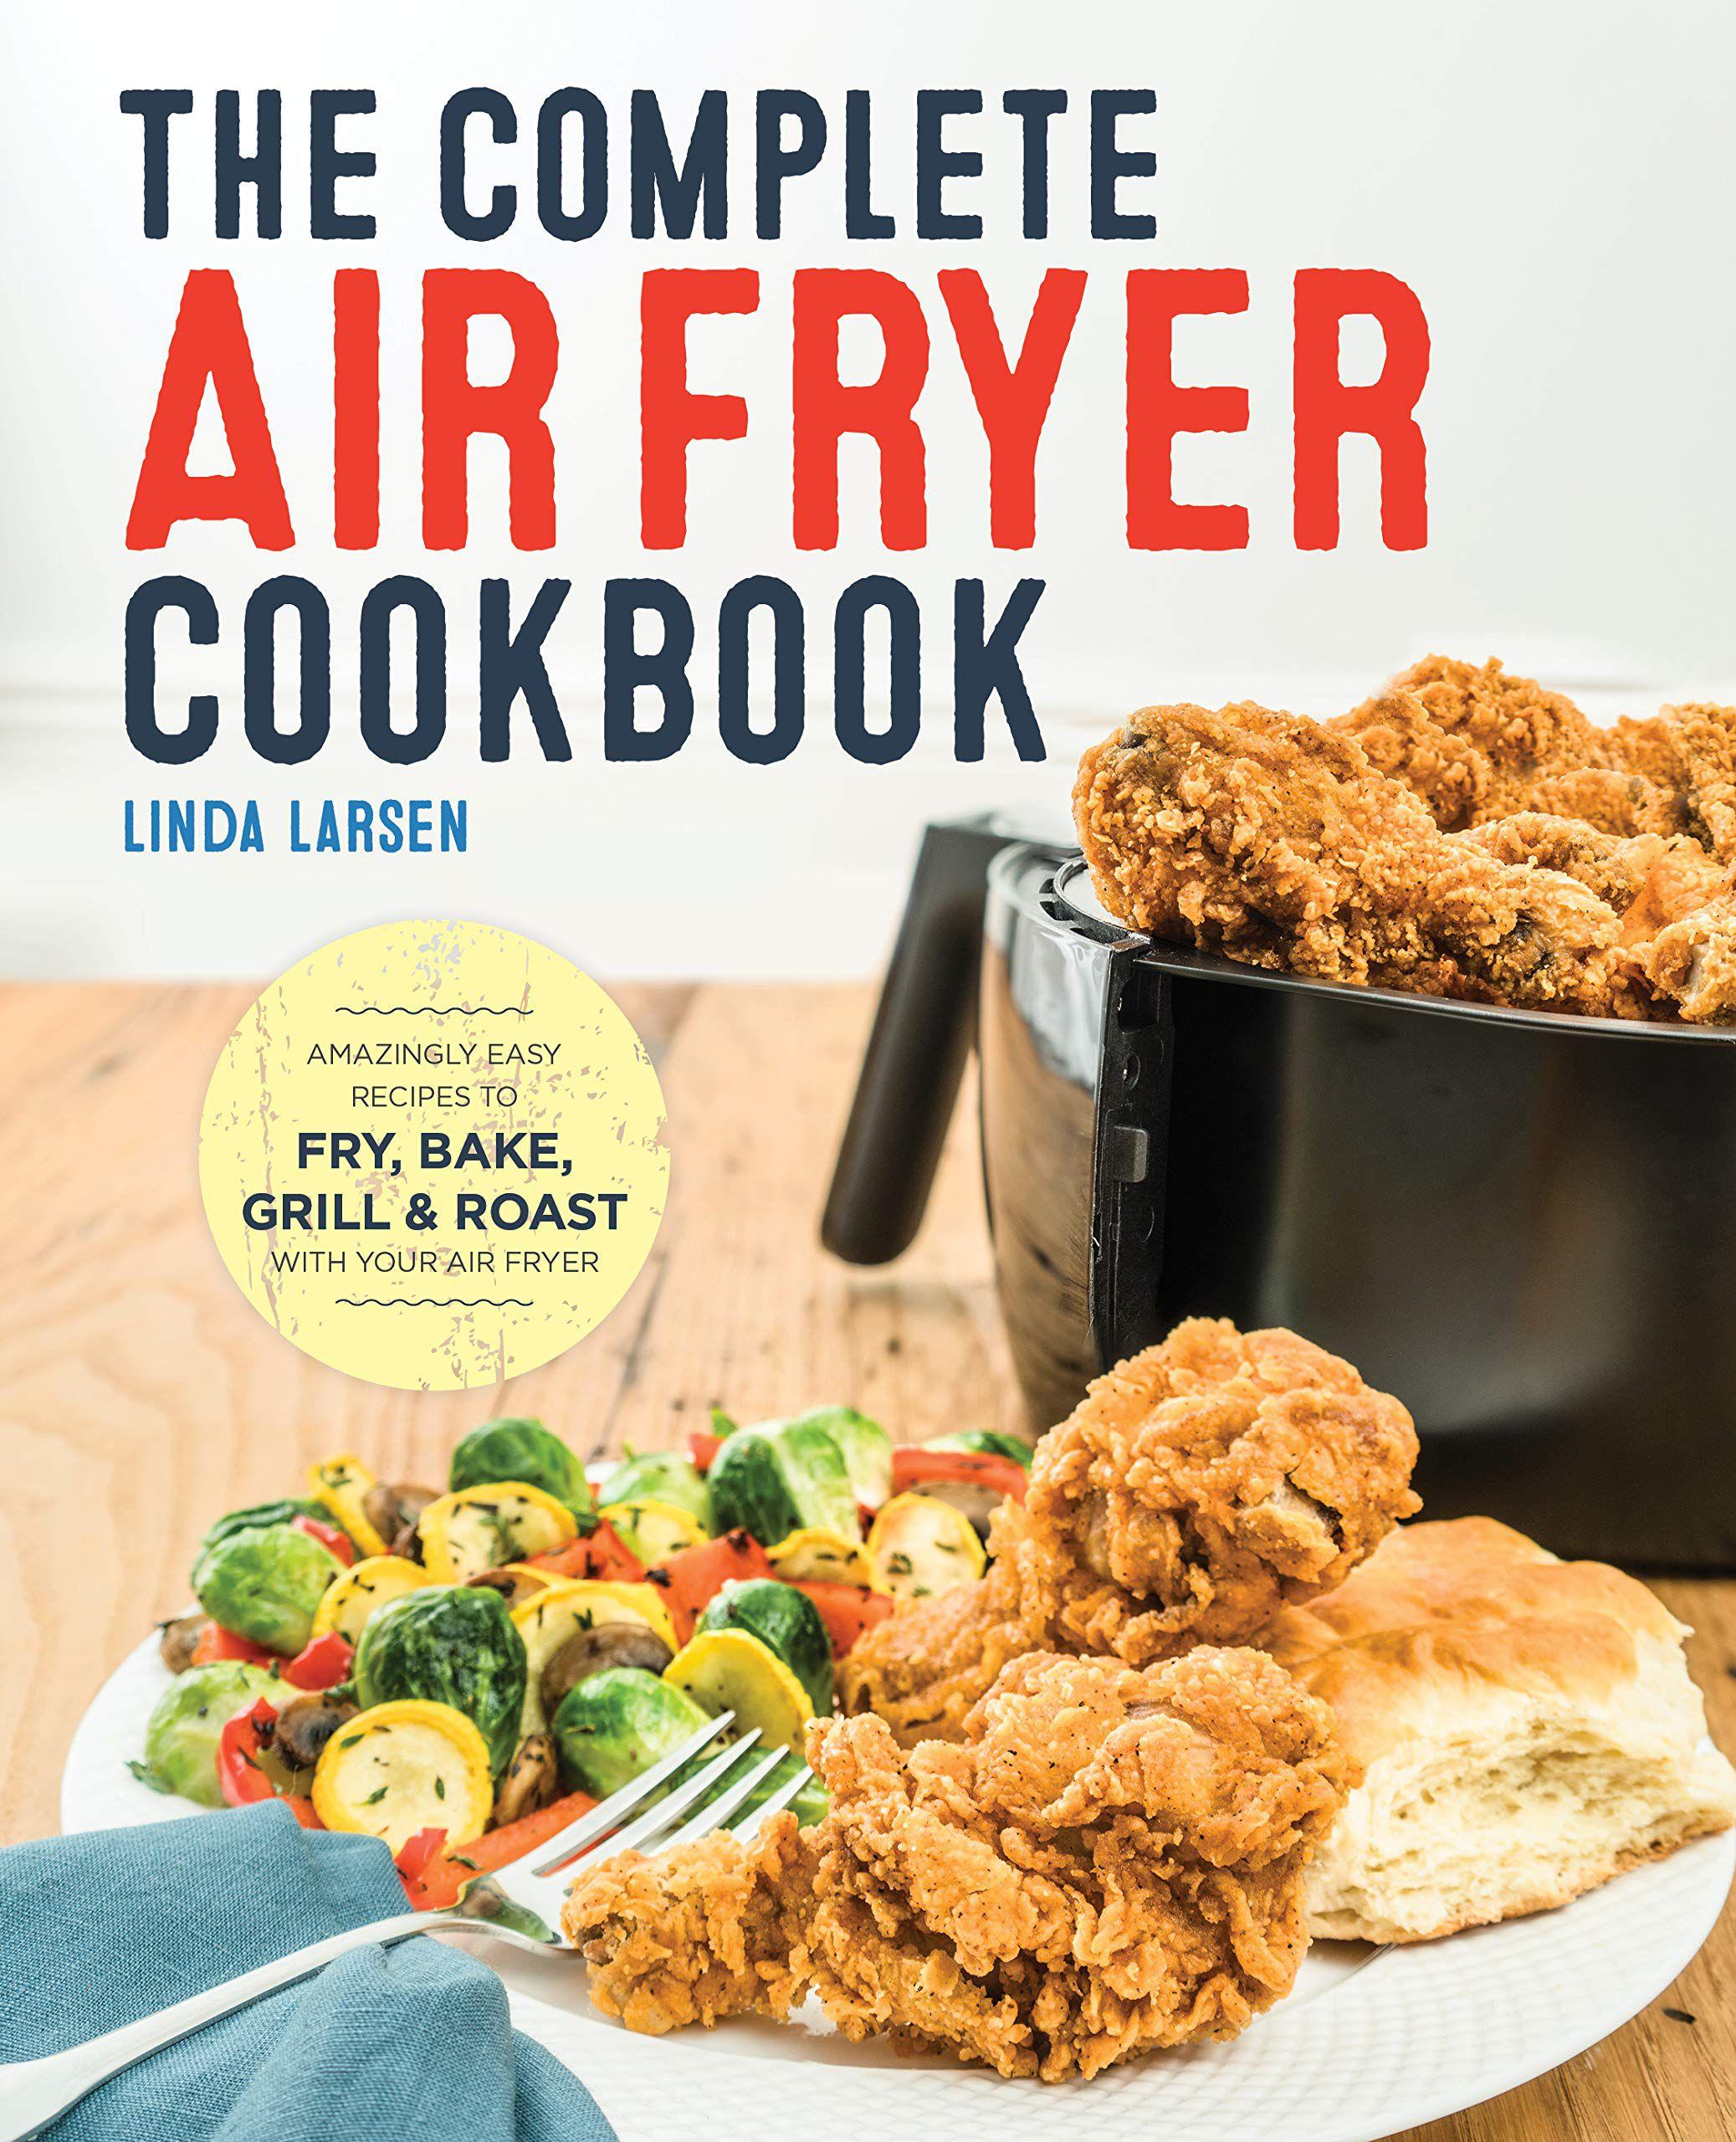 The Complete Air Fryer Cookbook—Best Air Fryer Cookbook